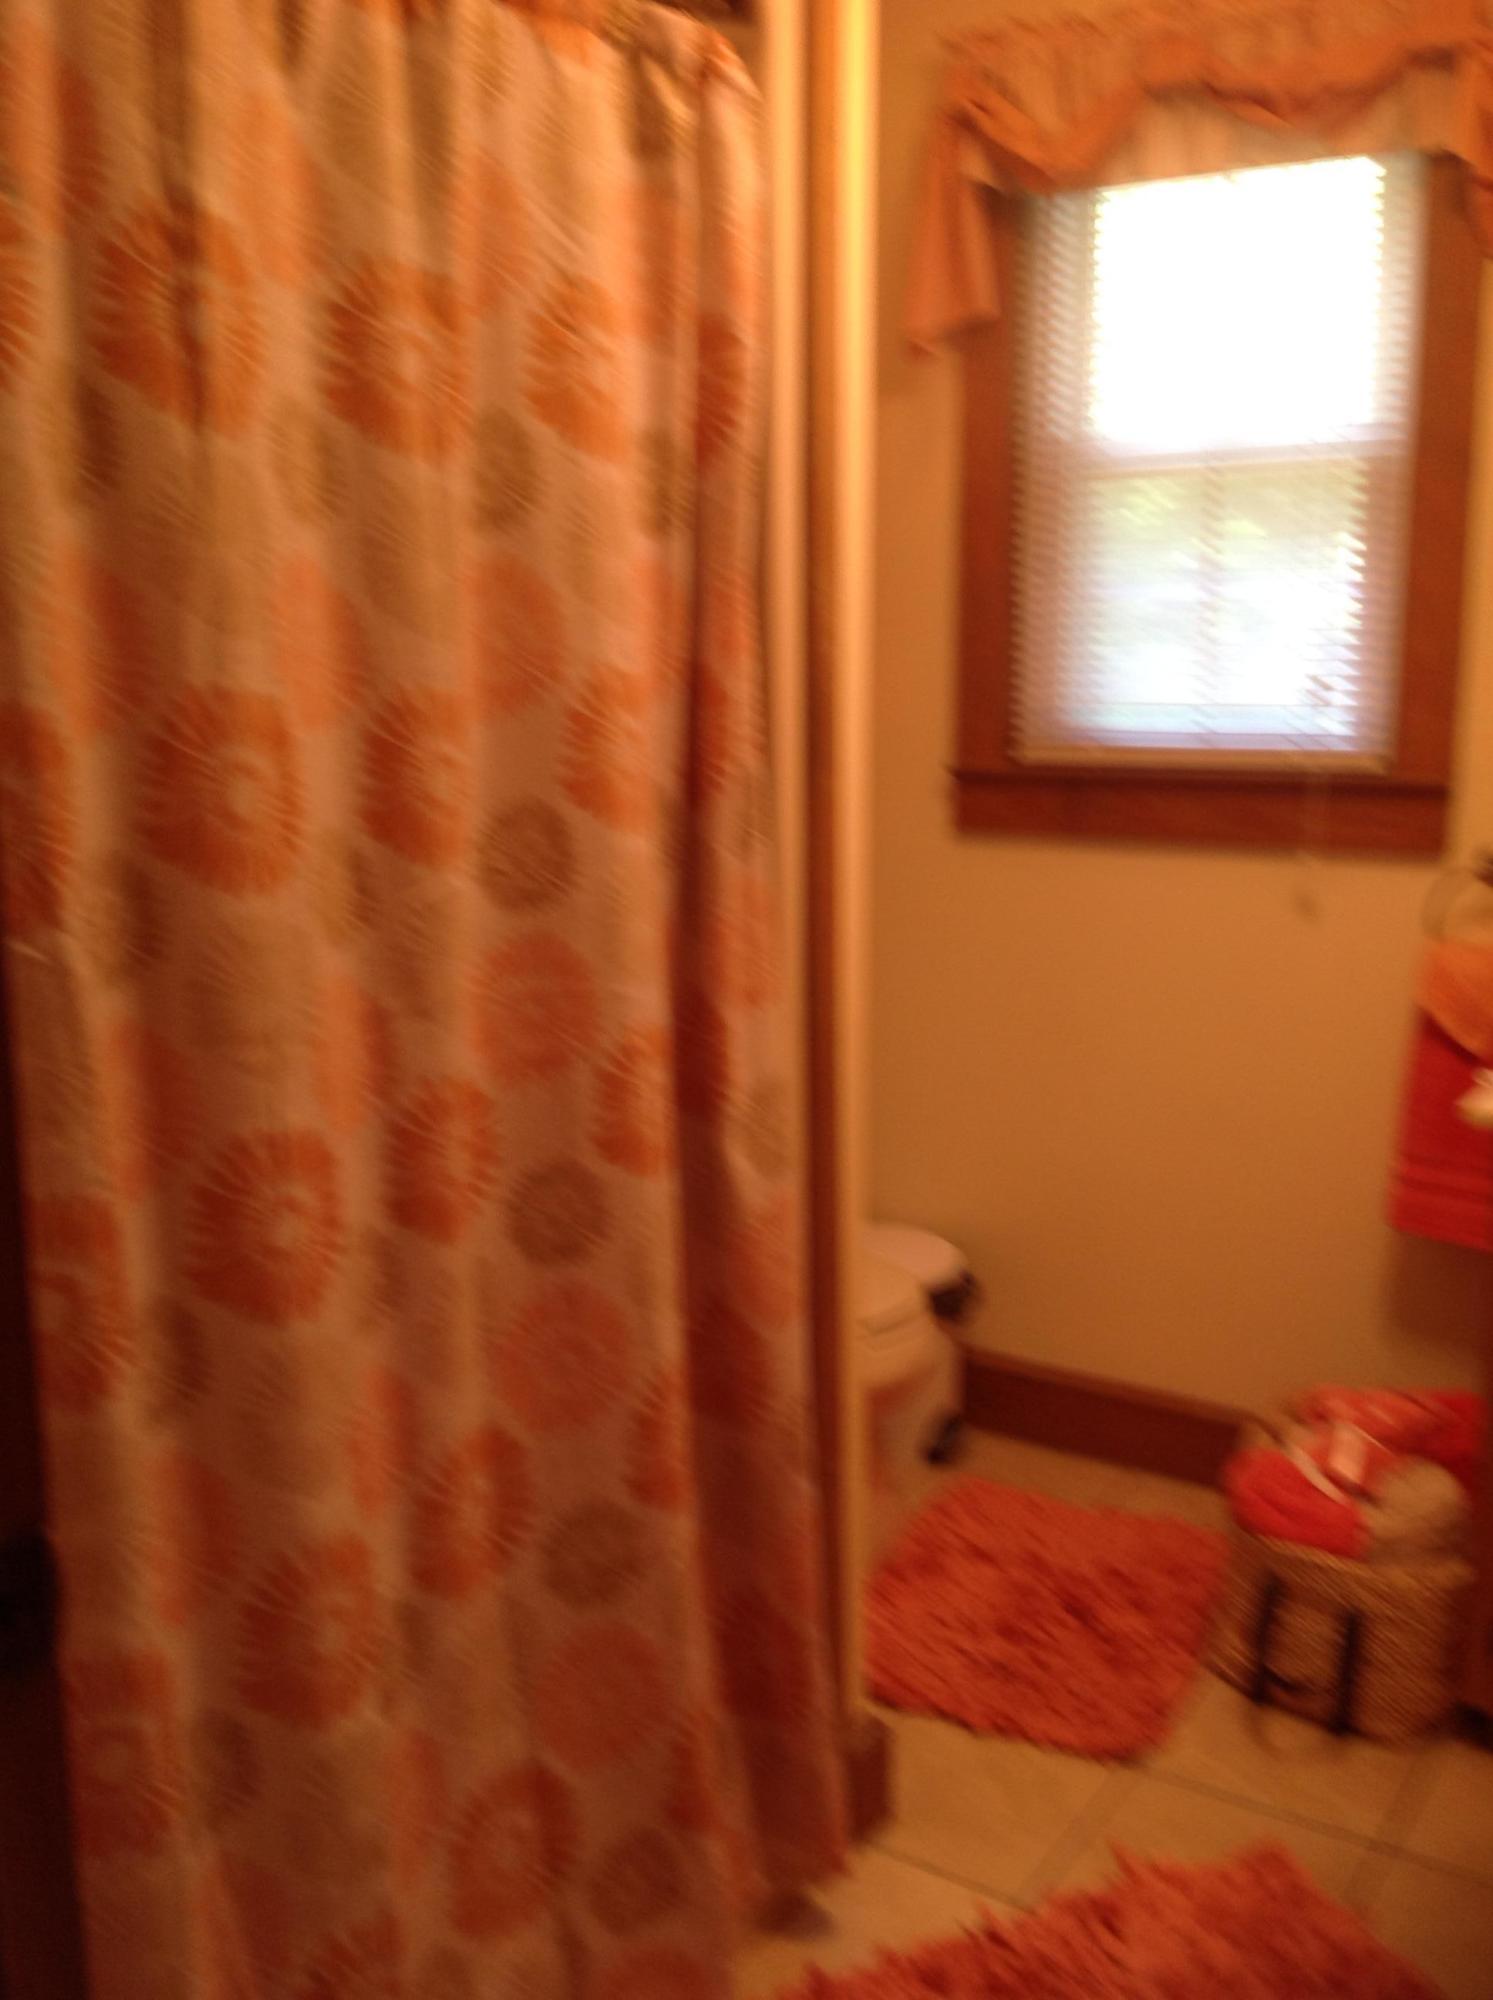 Belvedere II Homes For Sale - 122 Dogwood, Eutawville, SC - 19